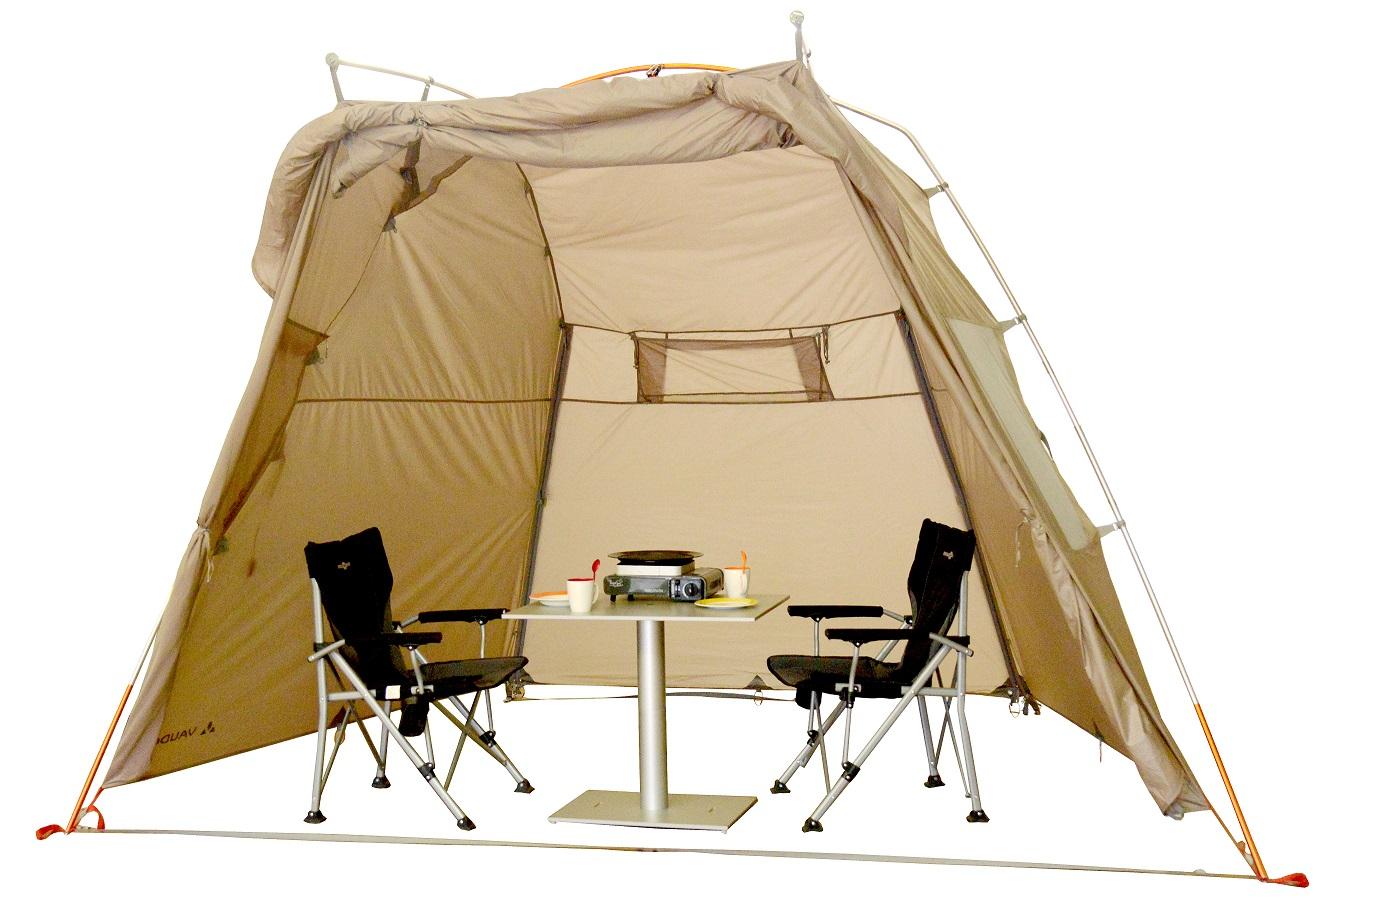 vanessa mobilcamping online shop vaude drive van tent. Black Bedroom Furniture Sets. Home Design Ideas